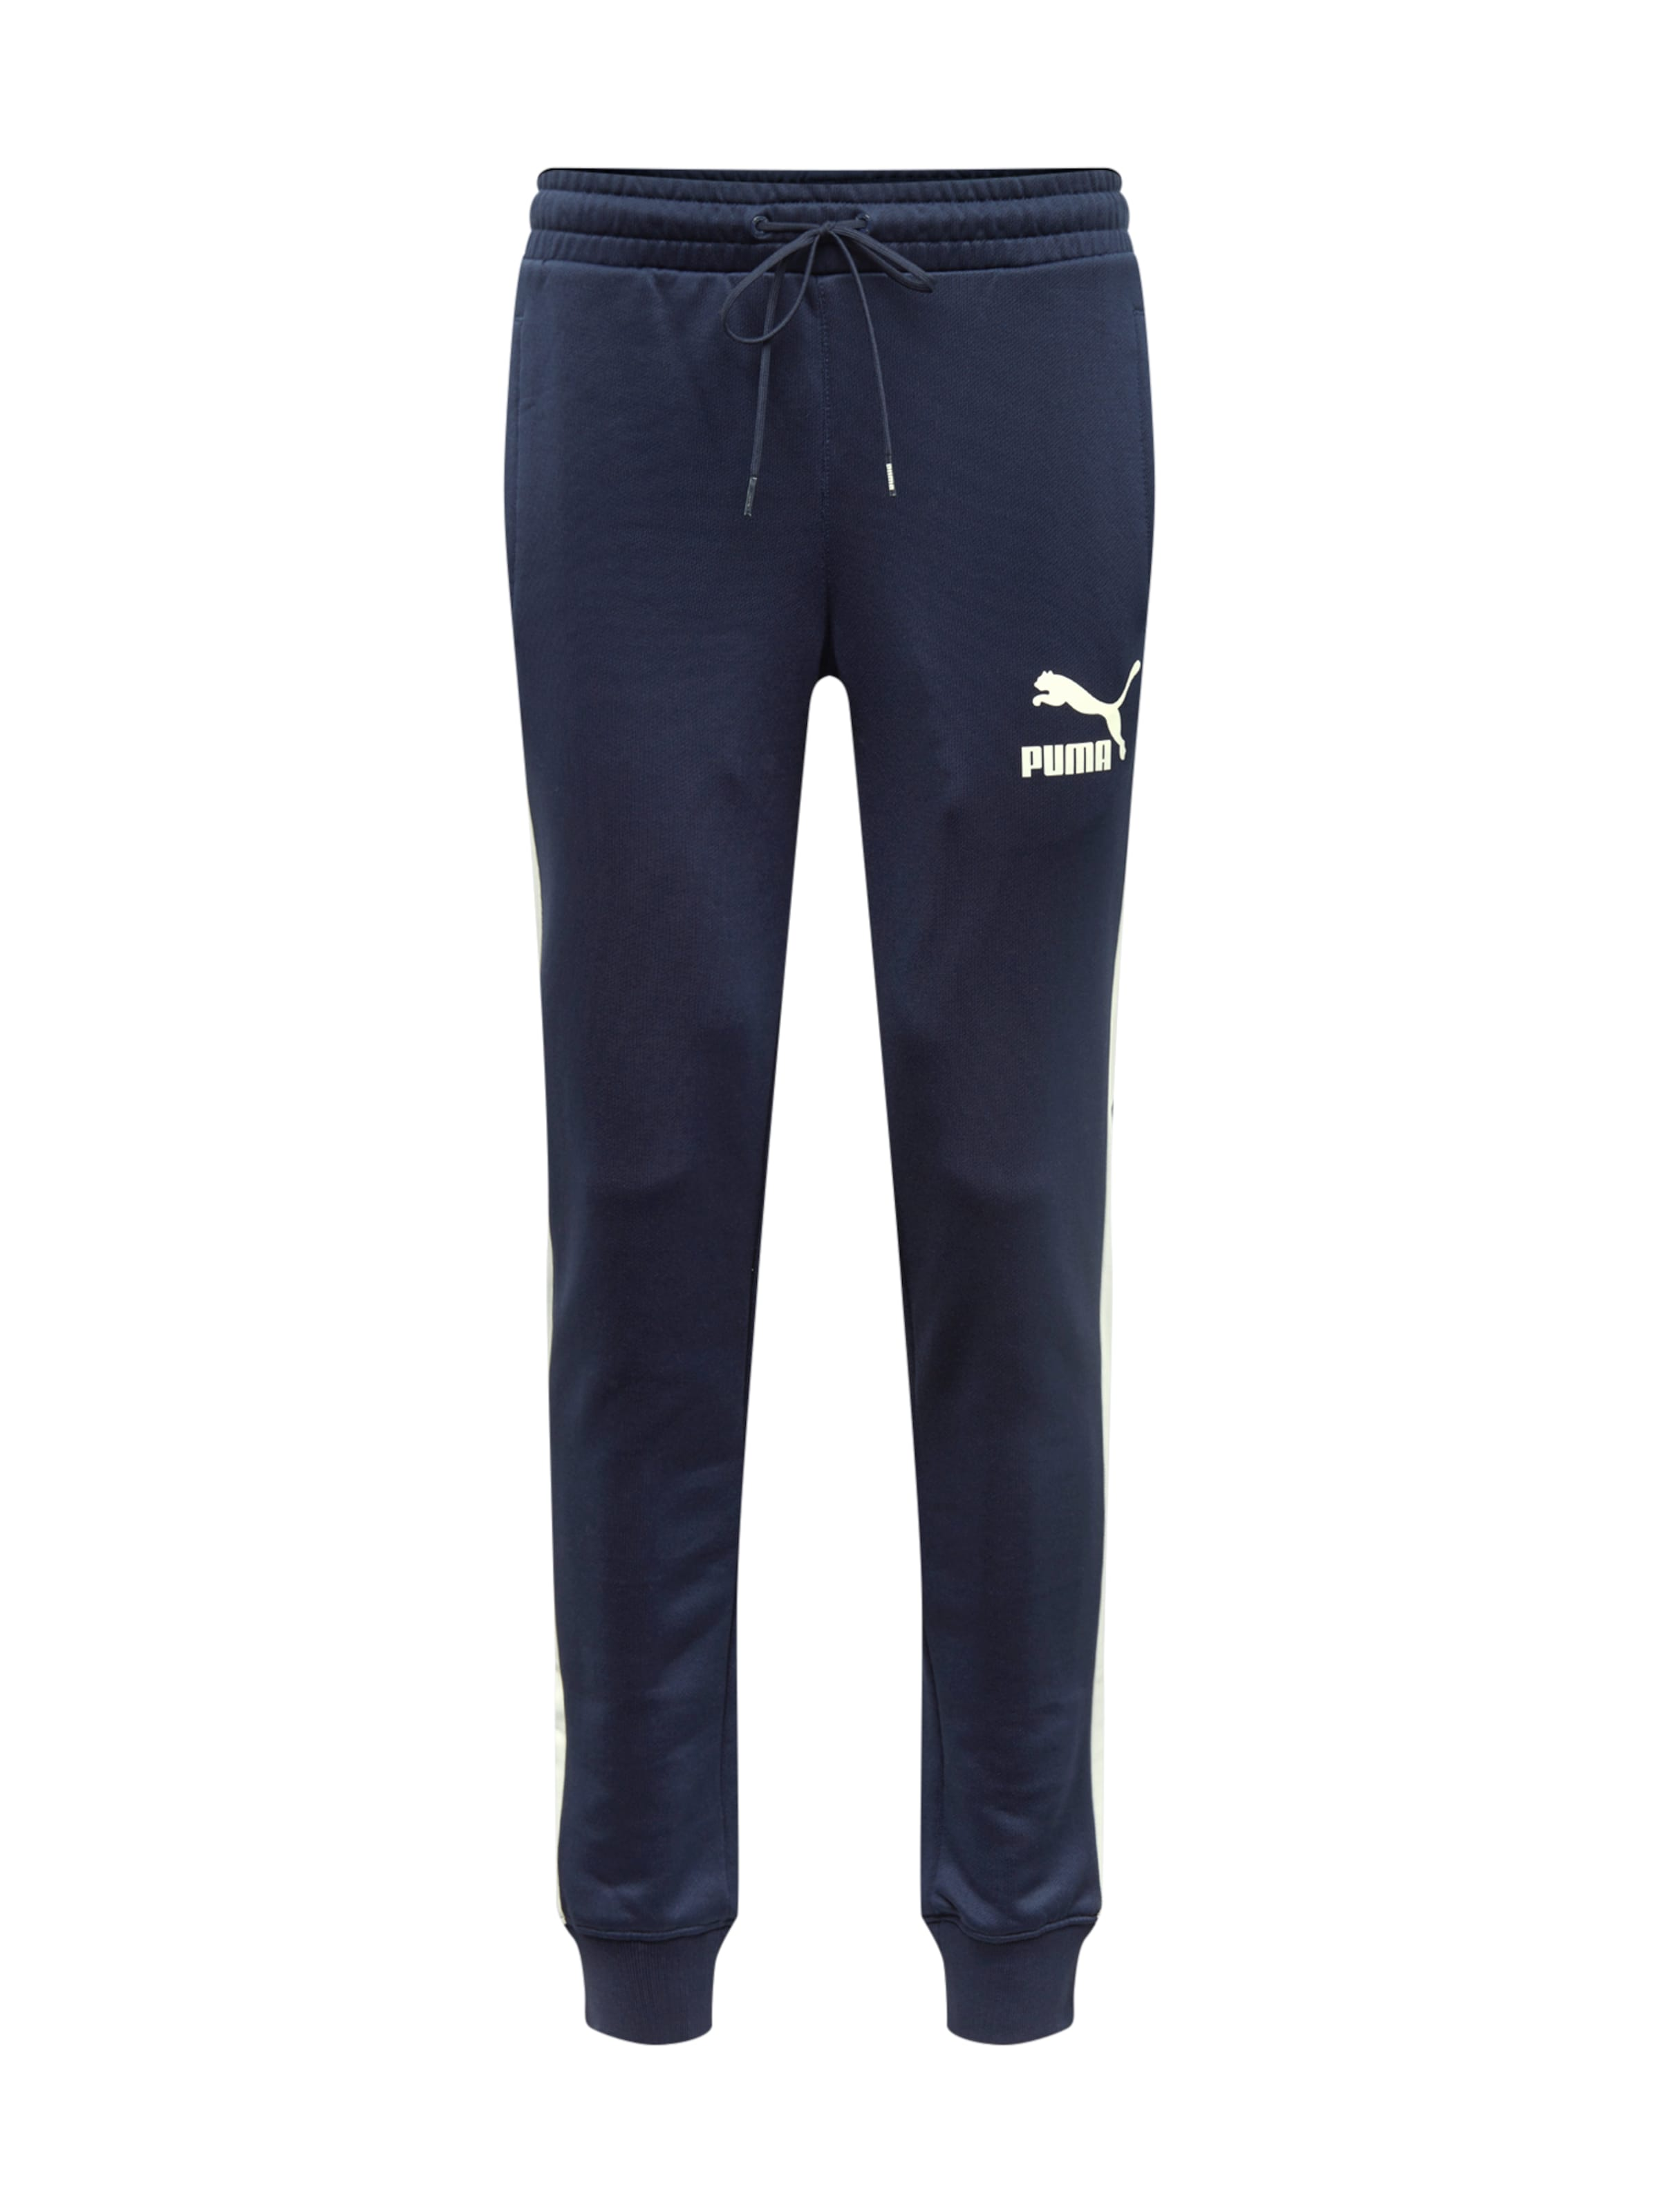 Pantalon En Puma 'iconic NuitJaune Bleu T7 Cuff' Aq4RjLc35